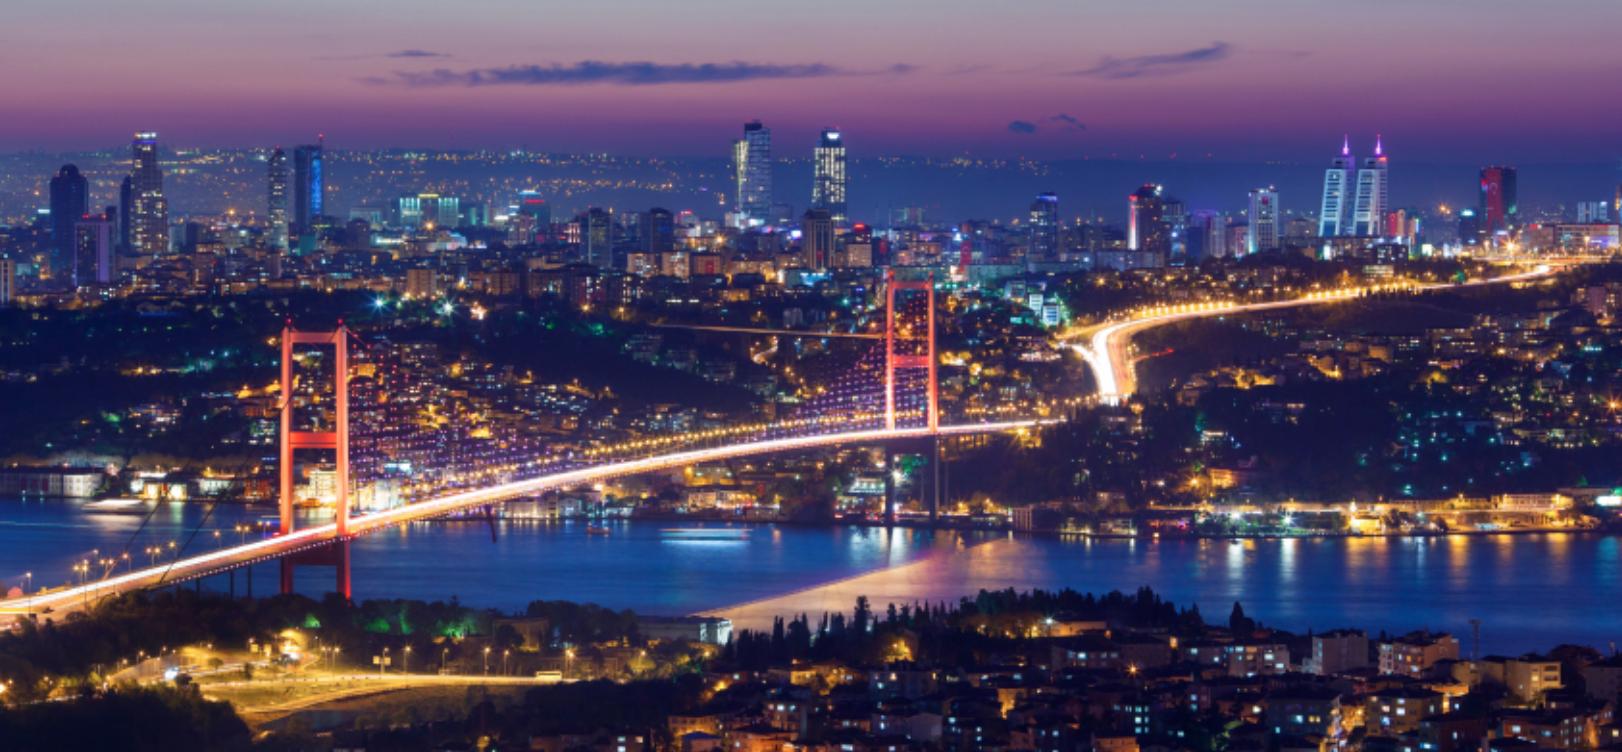 Какова цена покупки недвижимости в Турции?